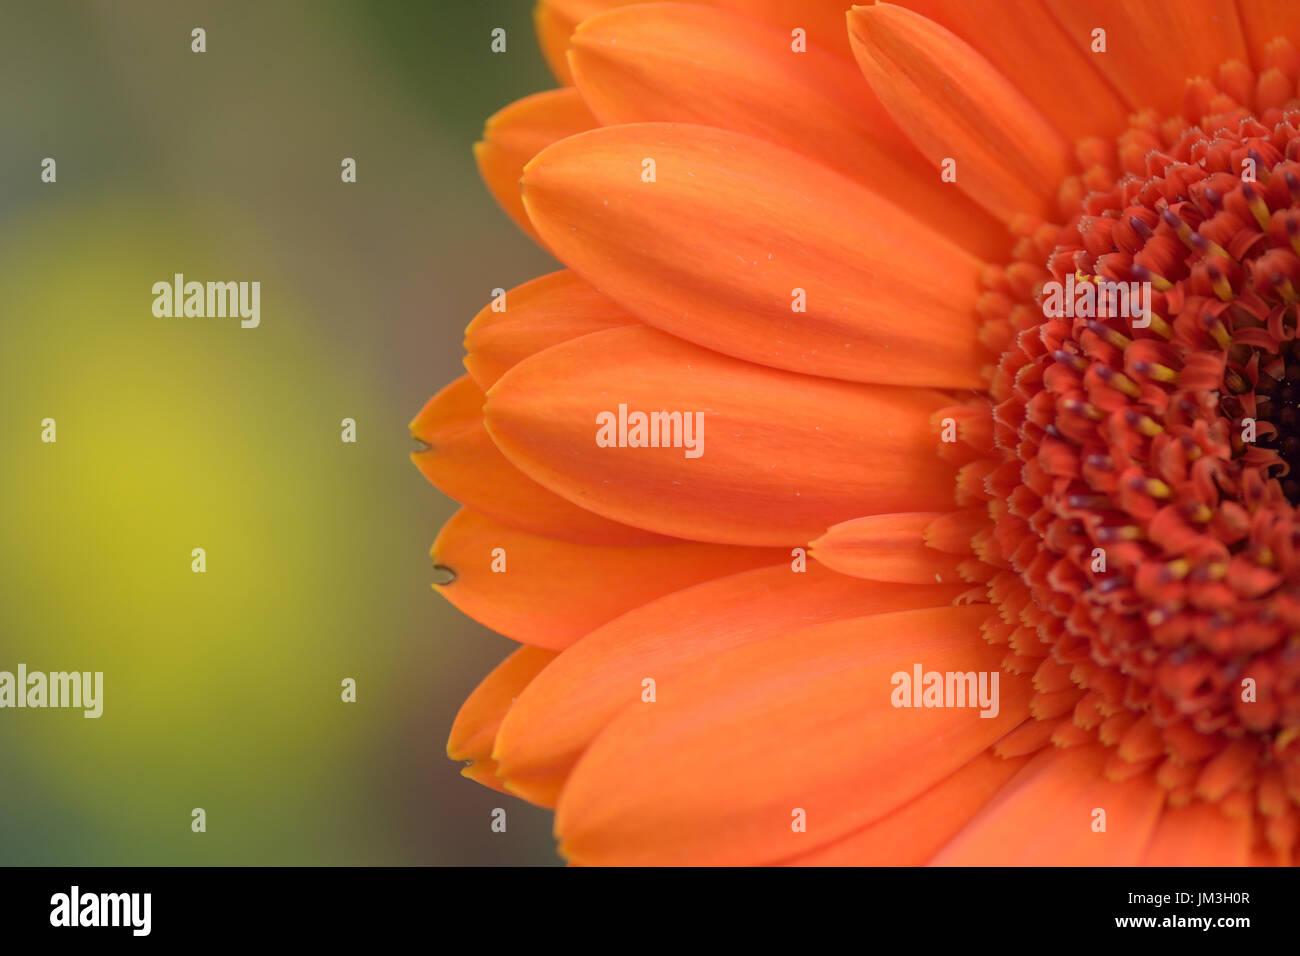 Makro-Details der orange farbigen Daisy Blume in horizontalen Rahmen Stockbild